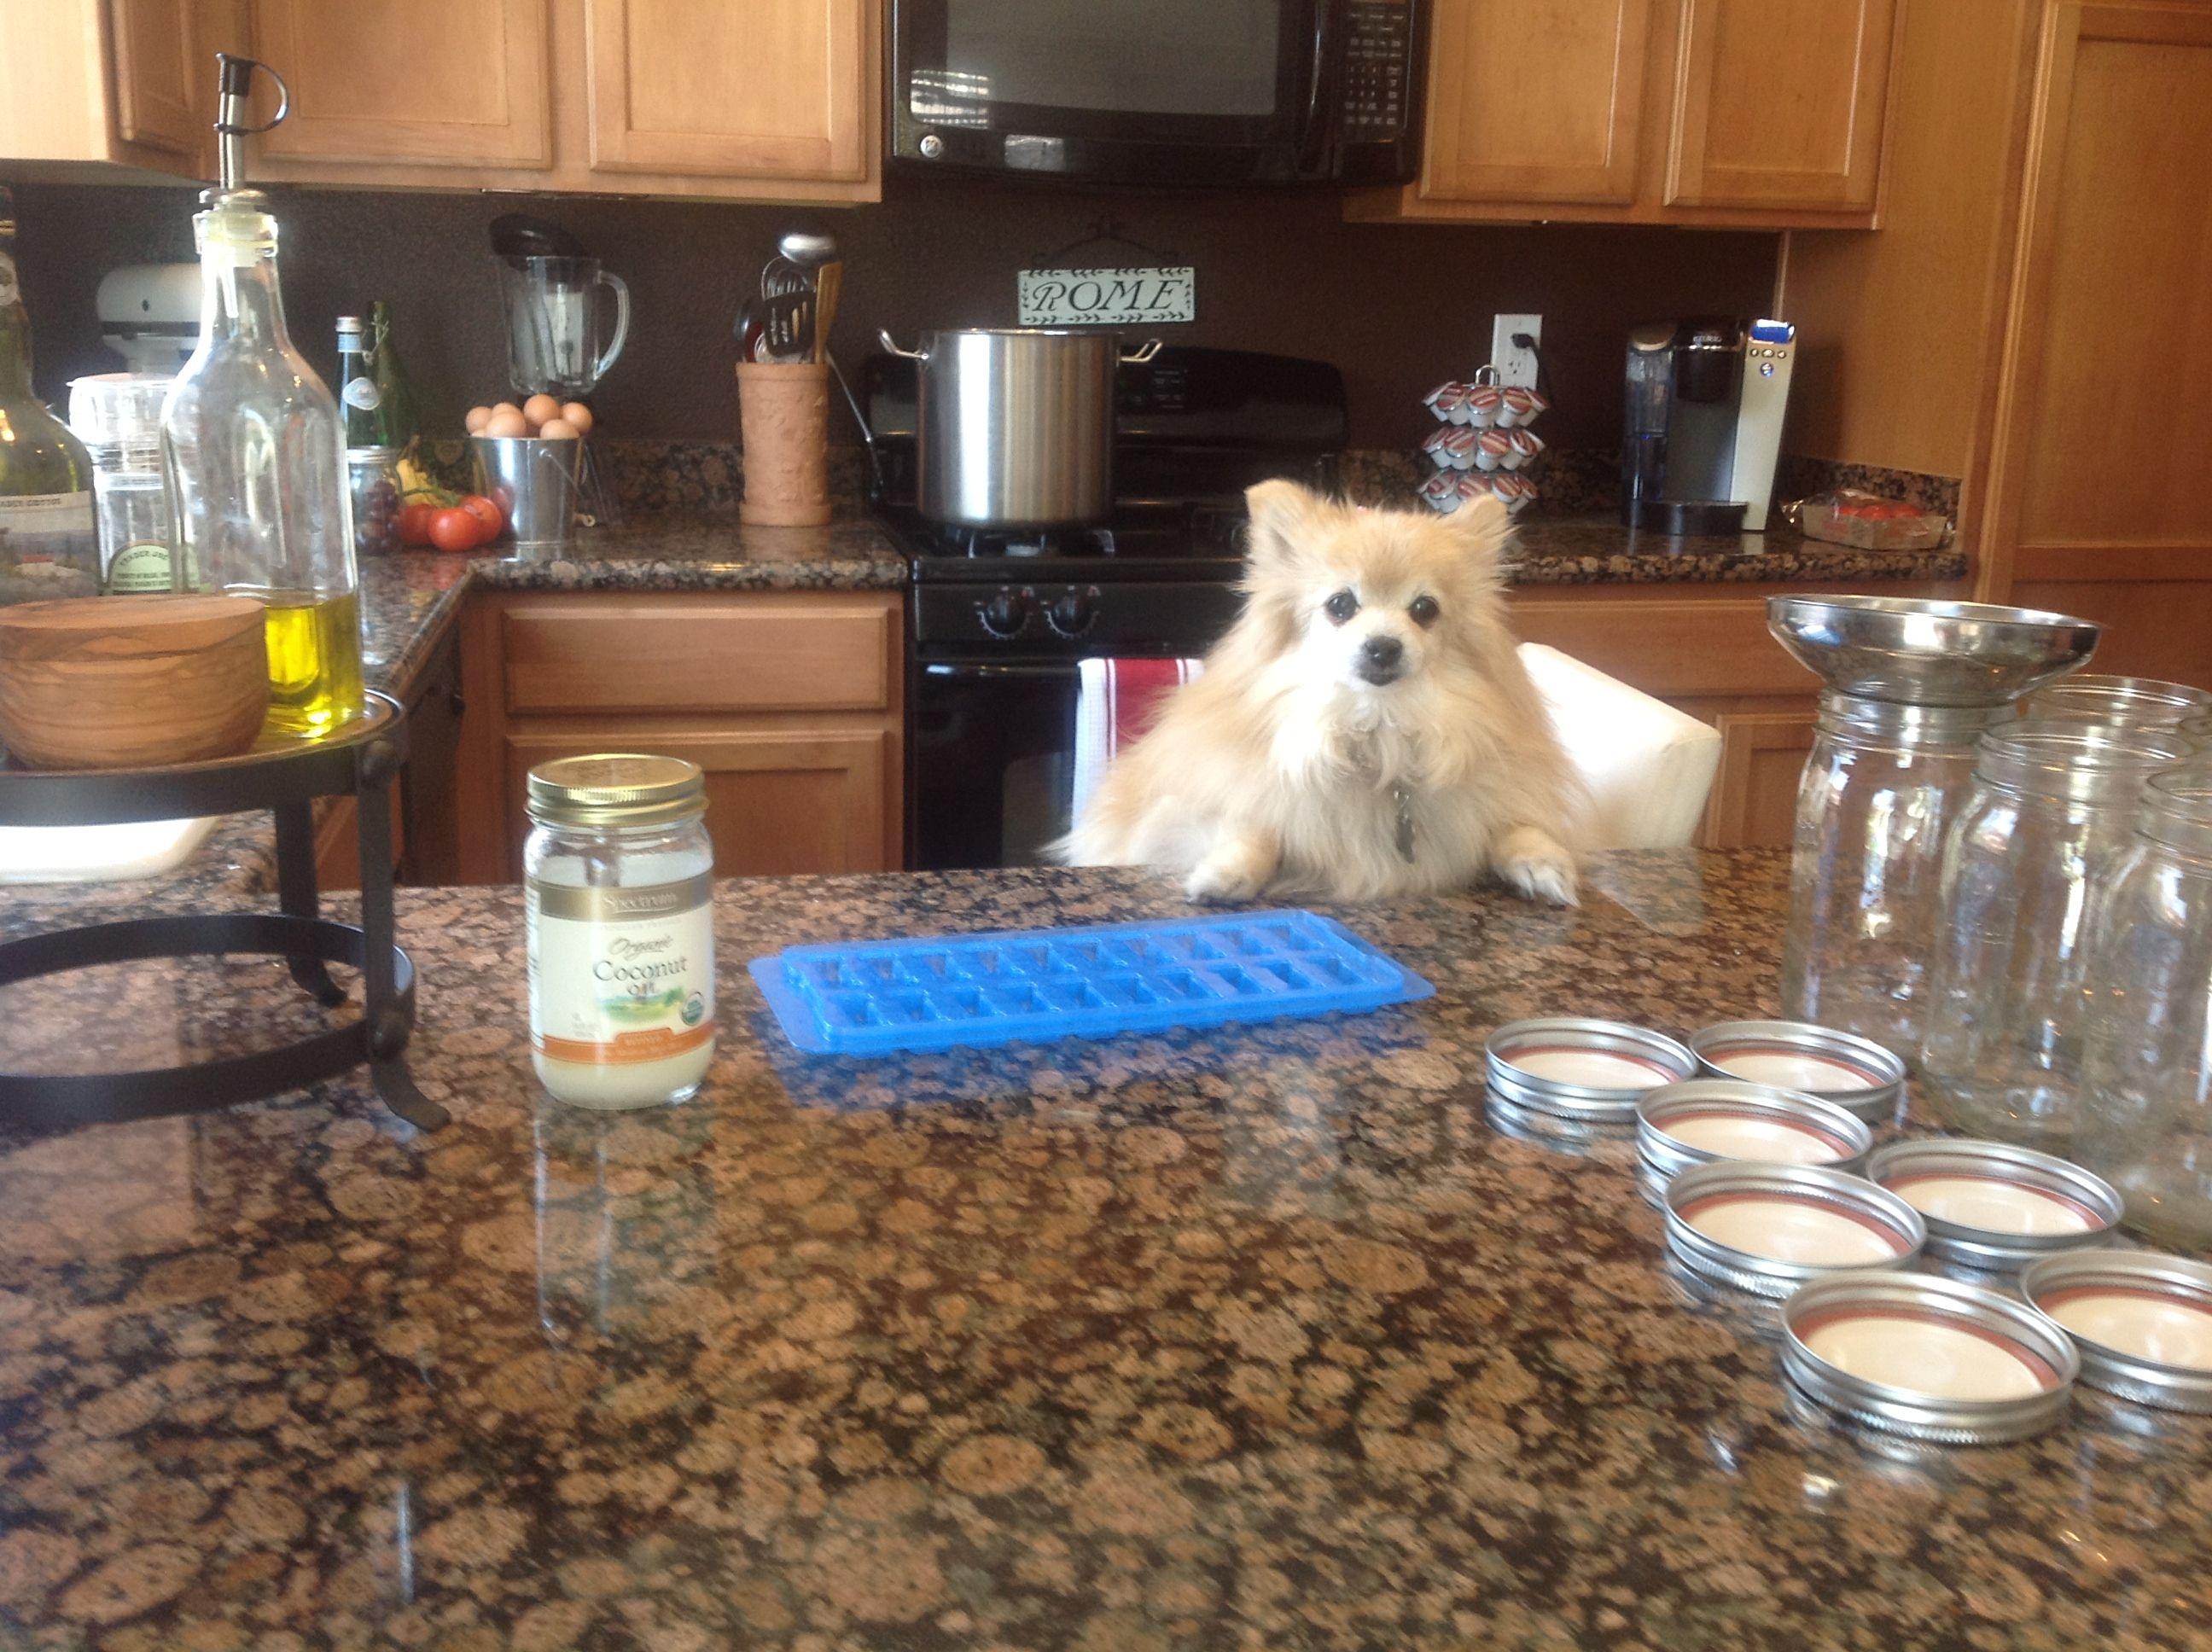 How to Make Cold Treats for Your Pomeranian Treats